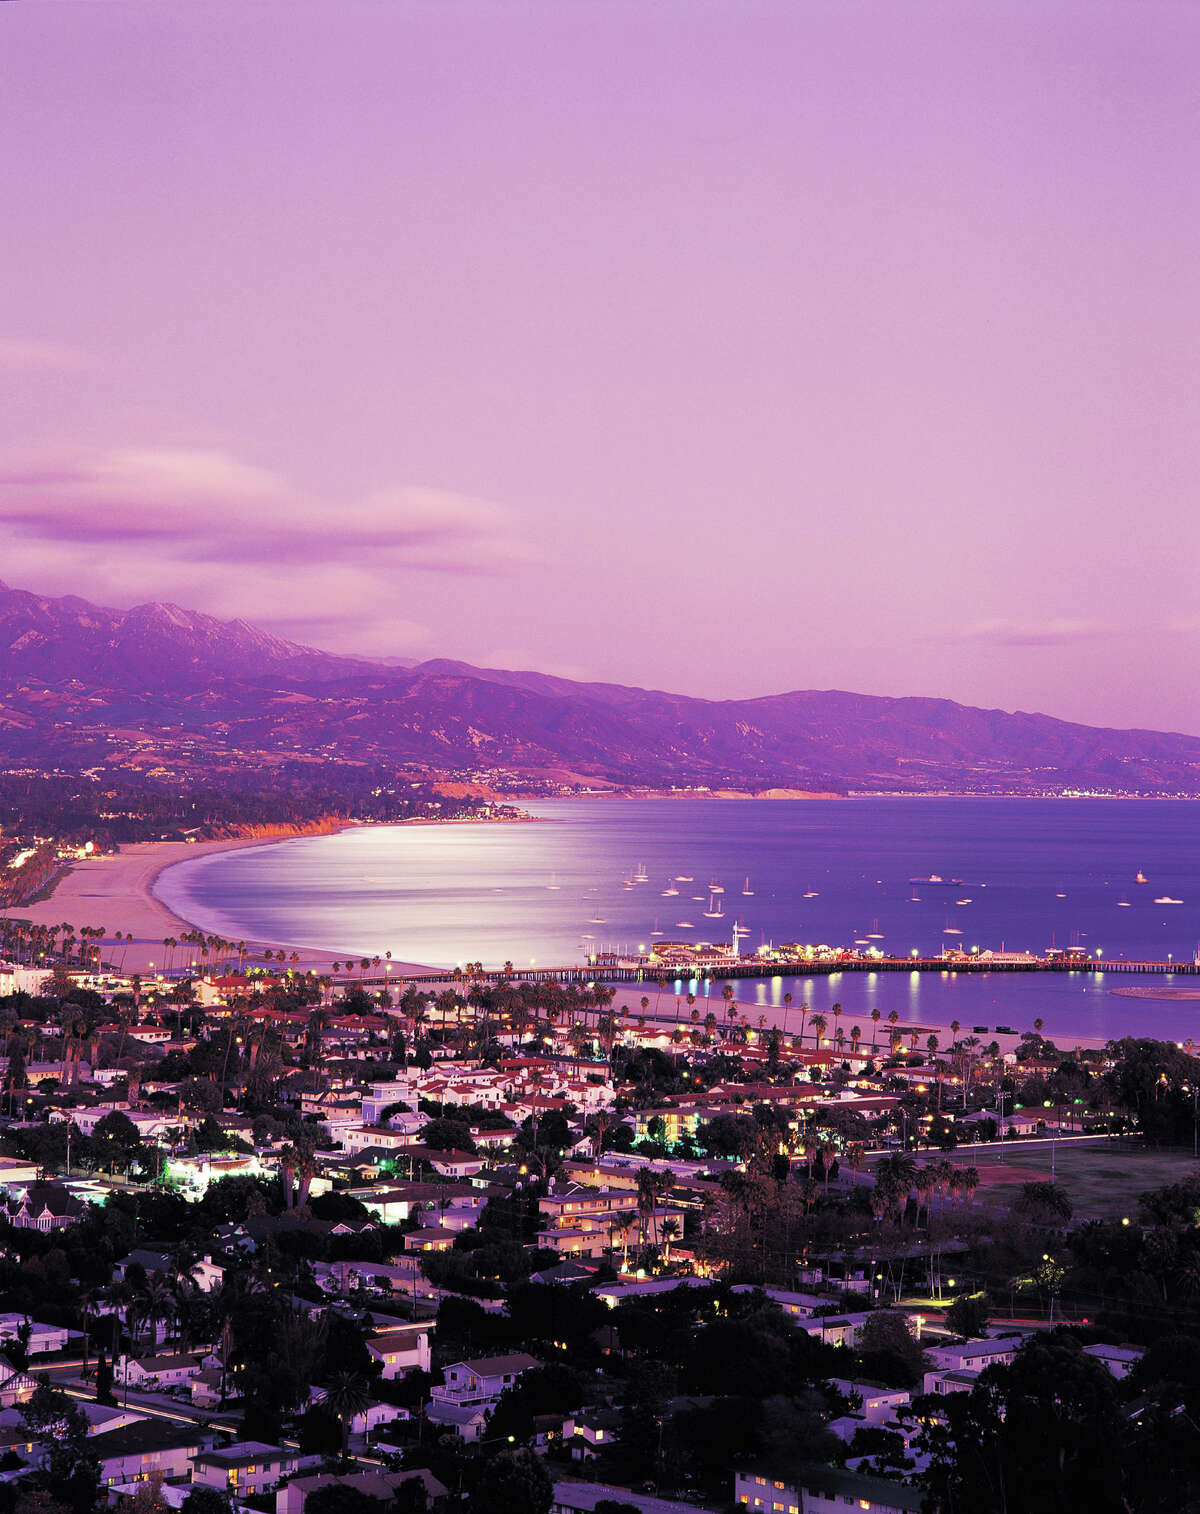 FAVORITE TRAVEL DESTINATION: Santa Barbara